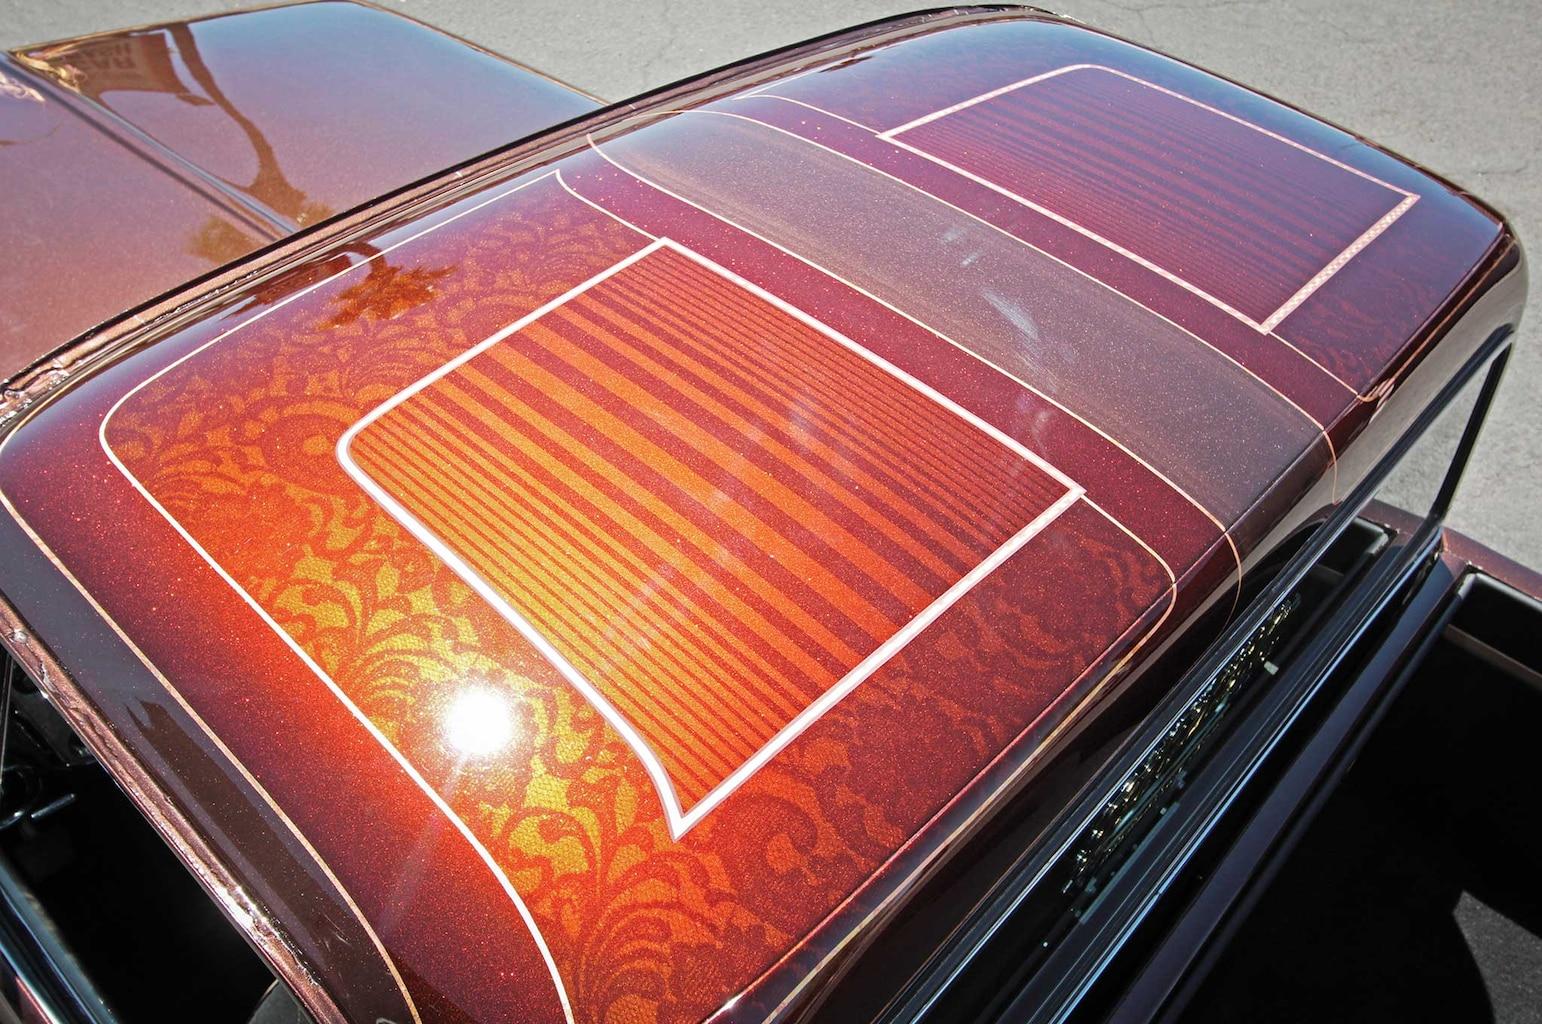 1971 chevrolet c10 roof graphics 004